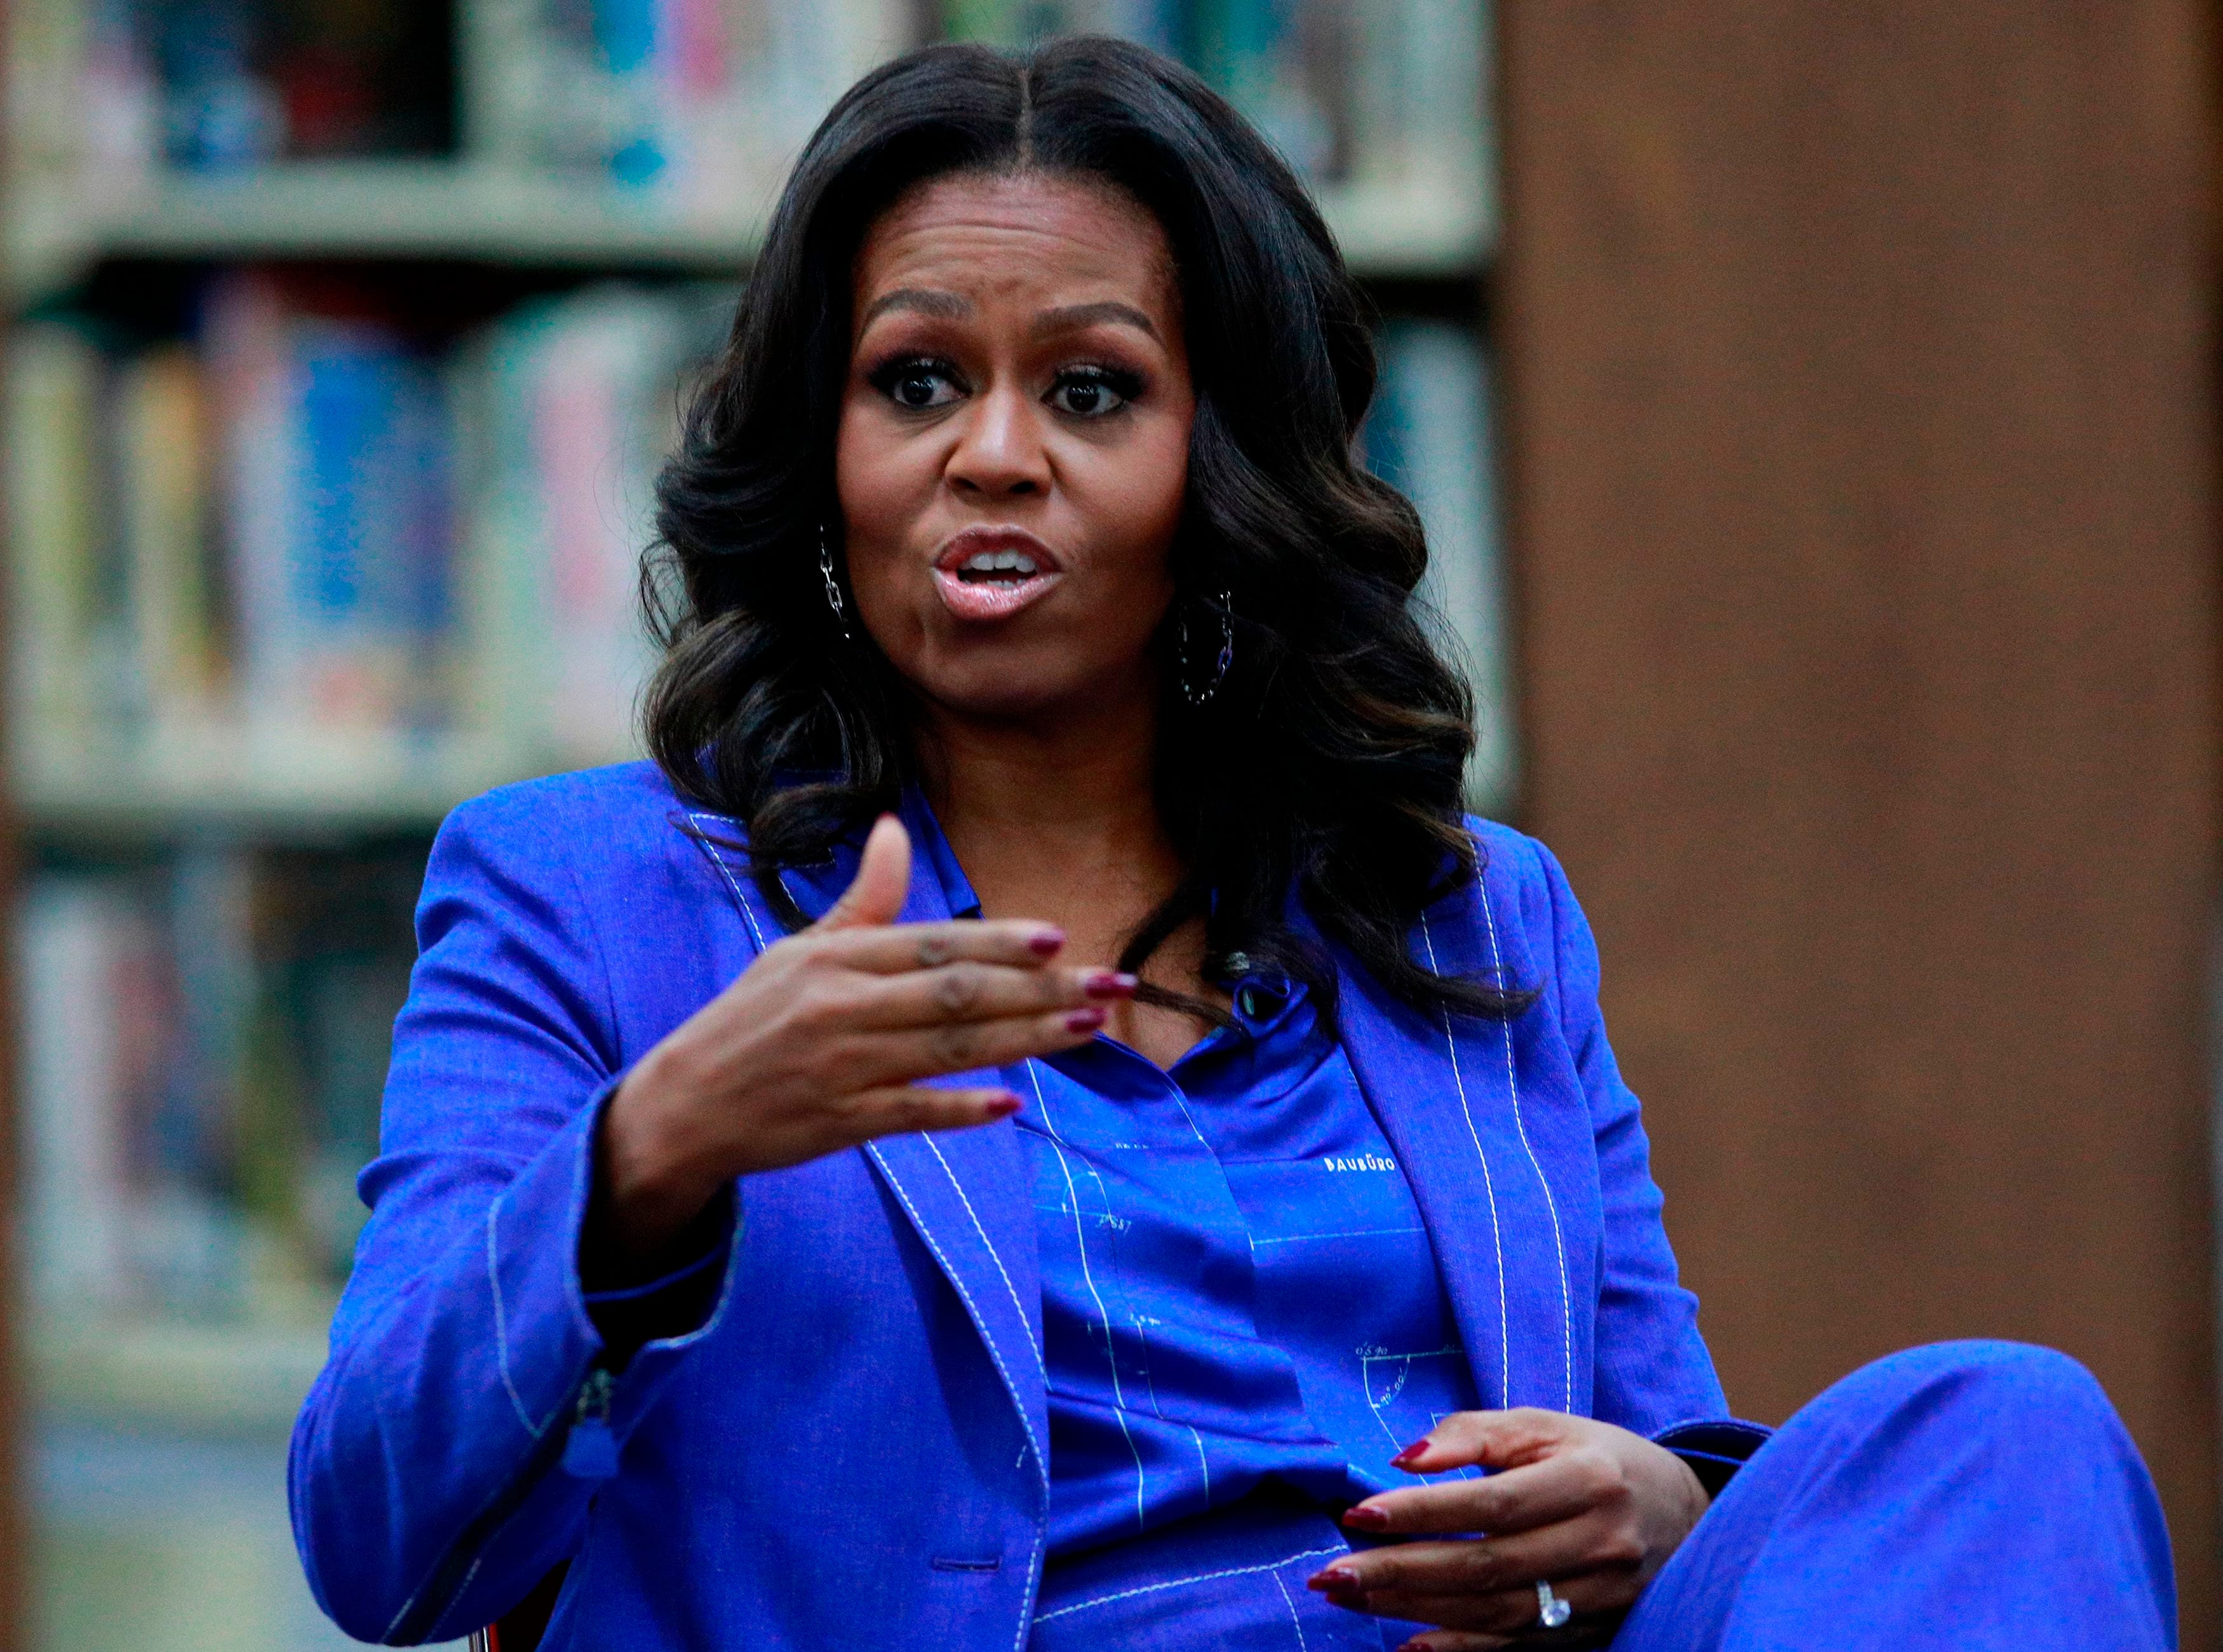 Michelle Obama talks 2020 Trump challengers, gives update on Malia and Sasha